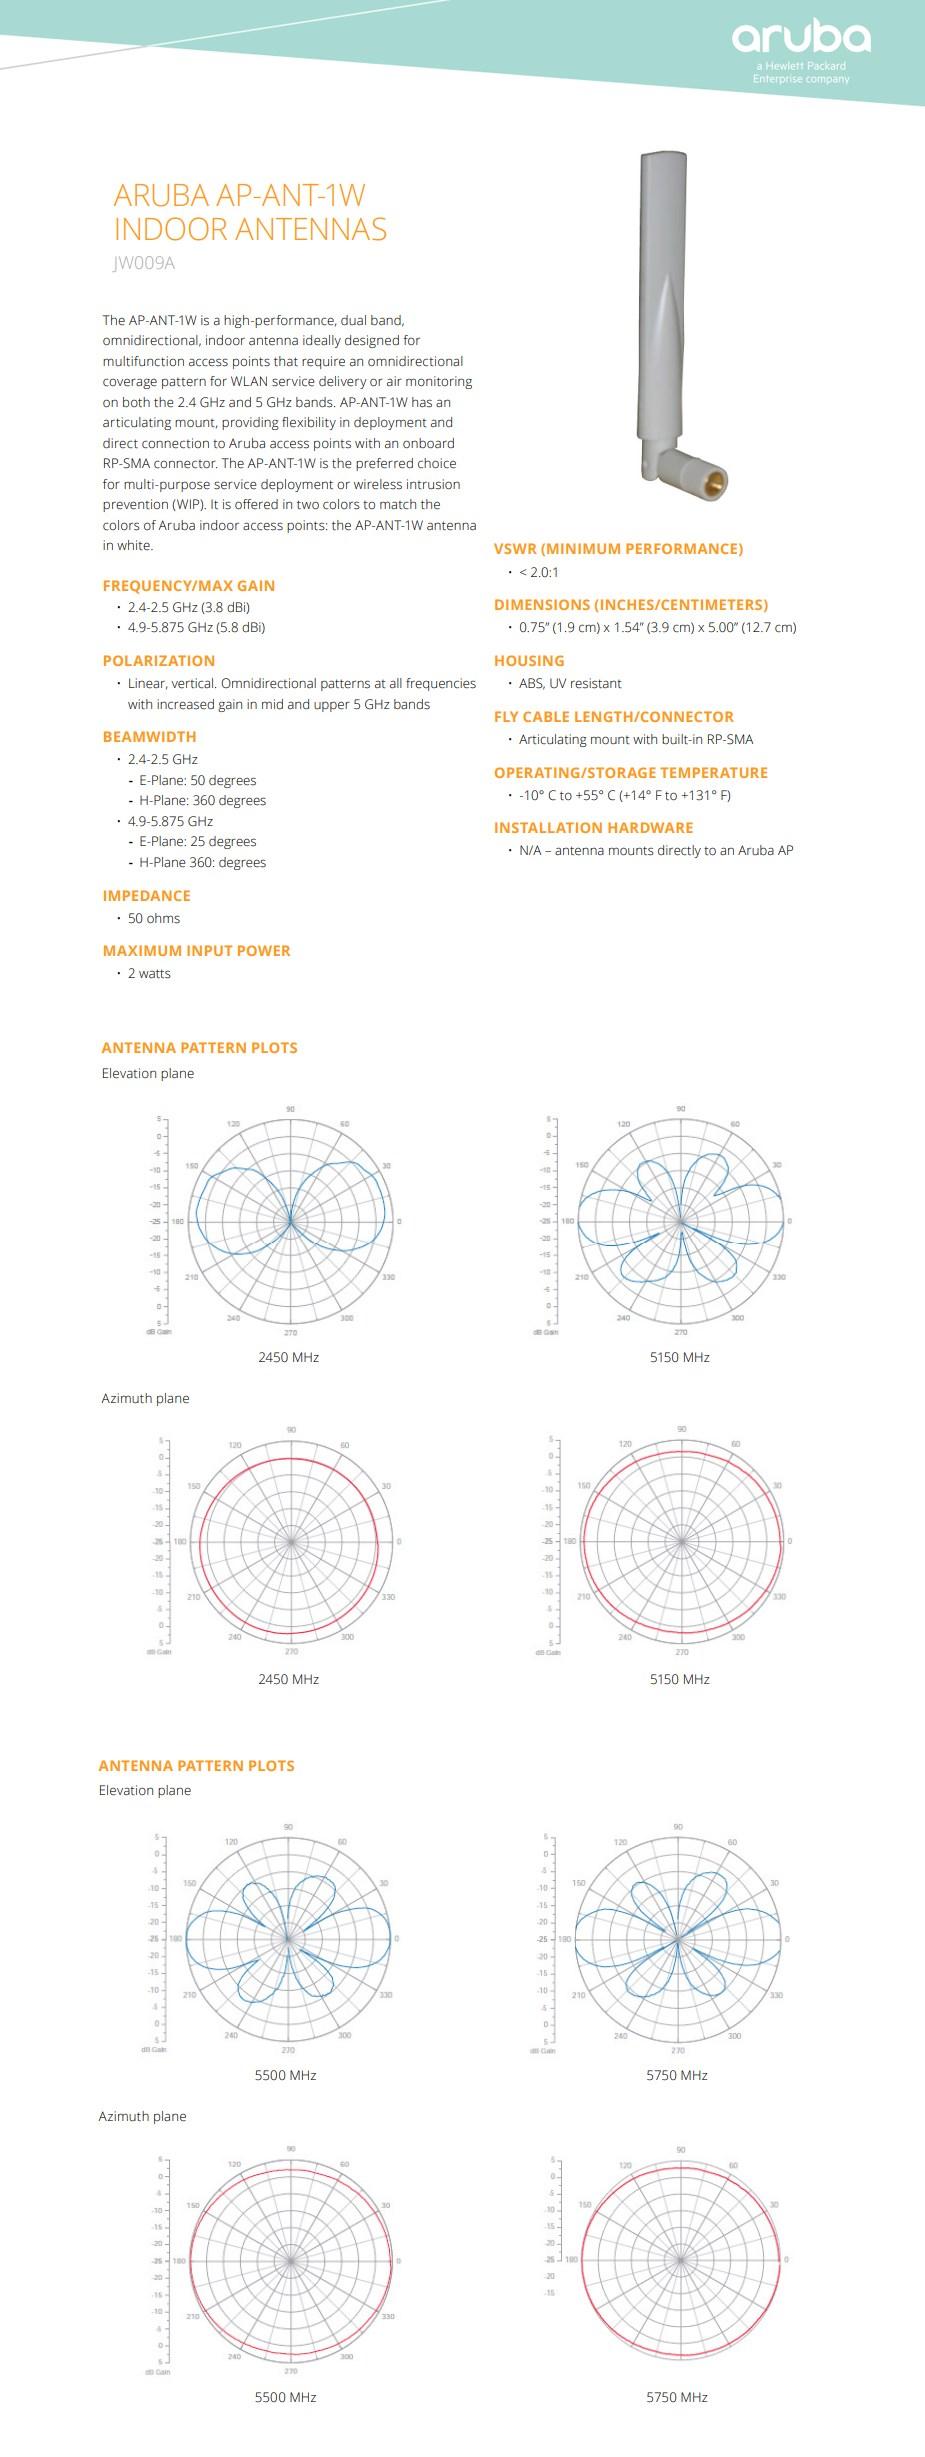 HPE Aruba ARUBA AP-ANT-1W Dual-Band Hi Gain Indoor Antenna - Overview 1